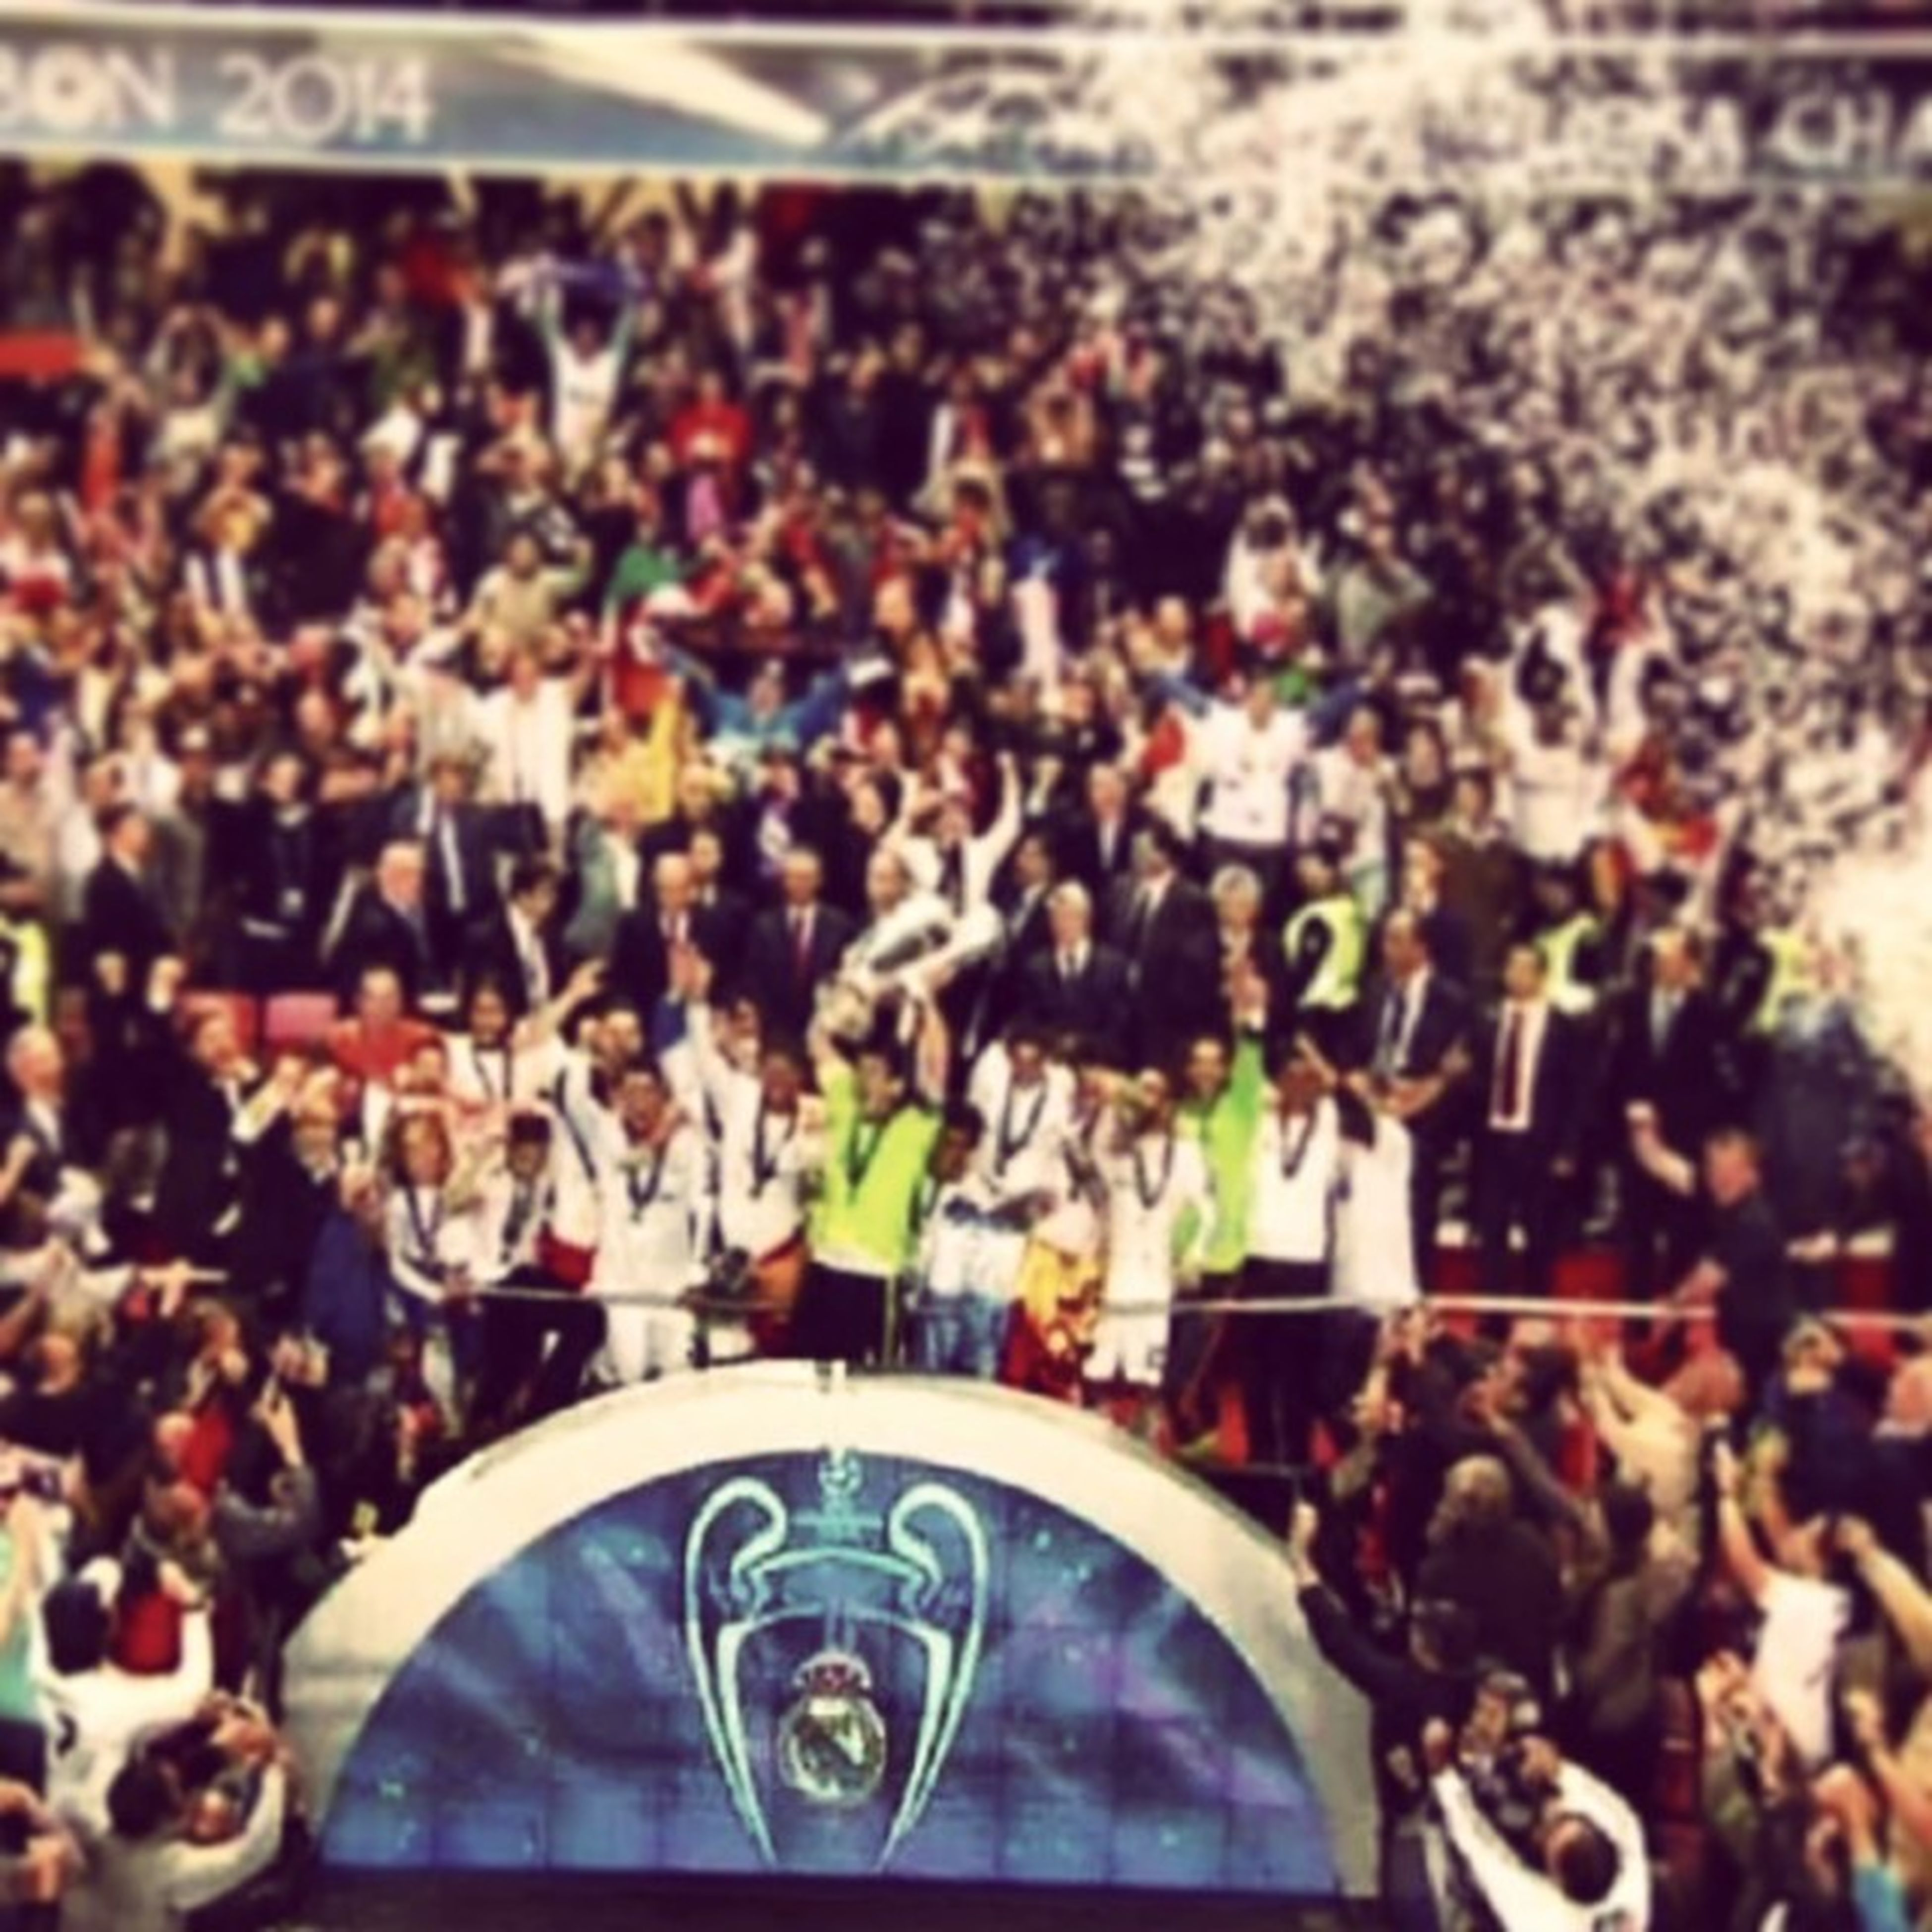 Champeons De Europa Real Madrid UCL final winners la_décima Finally.. Its back home ?